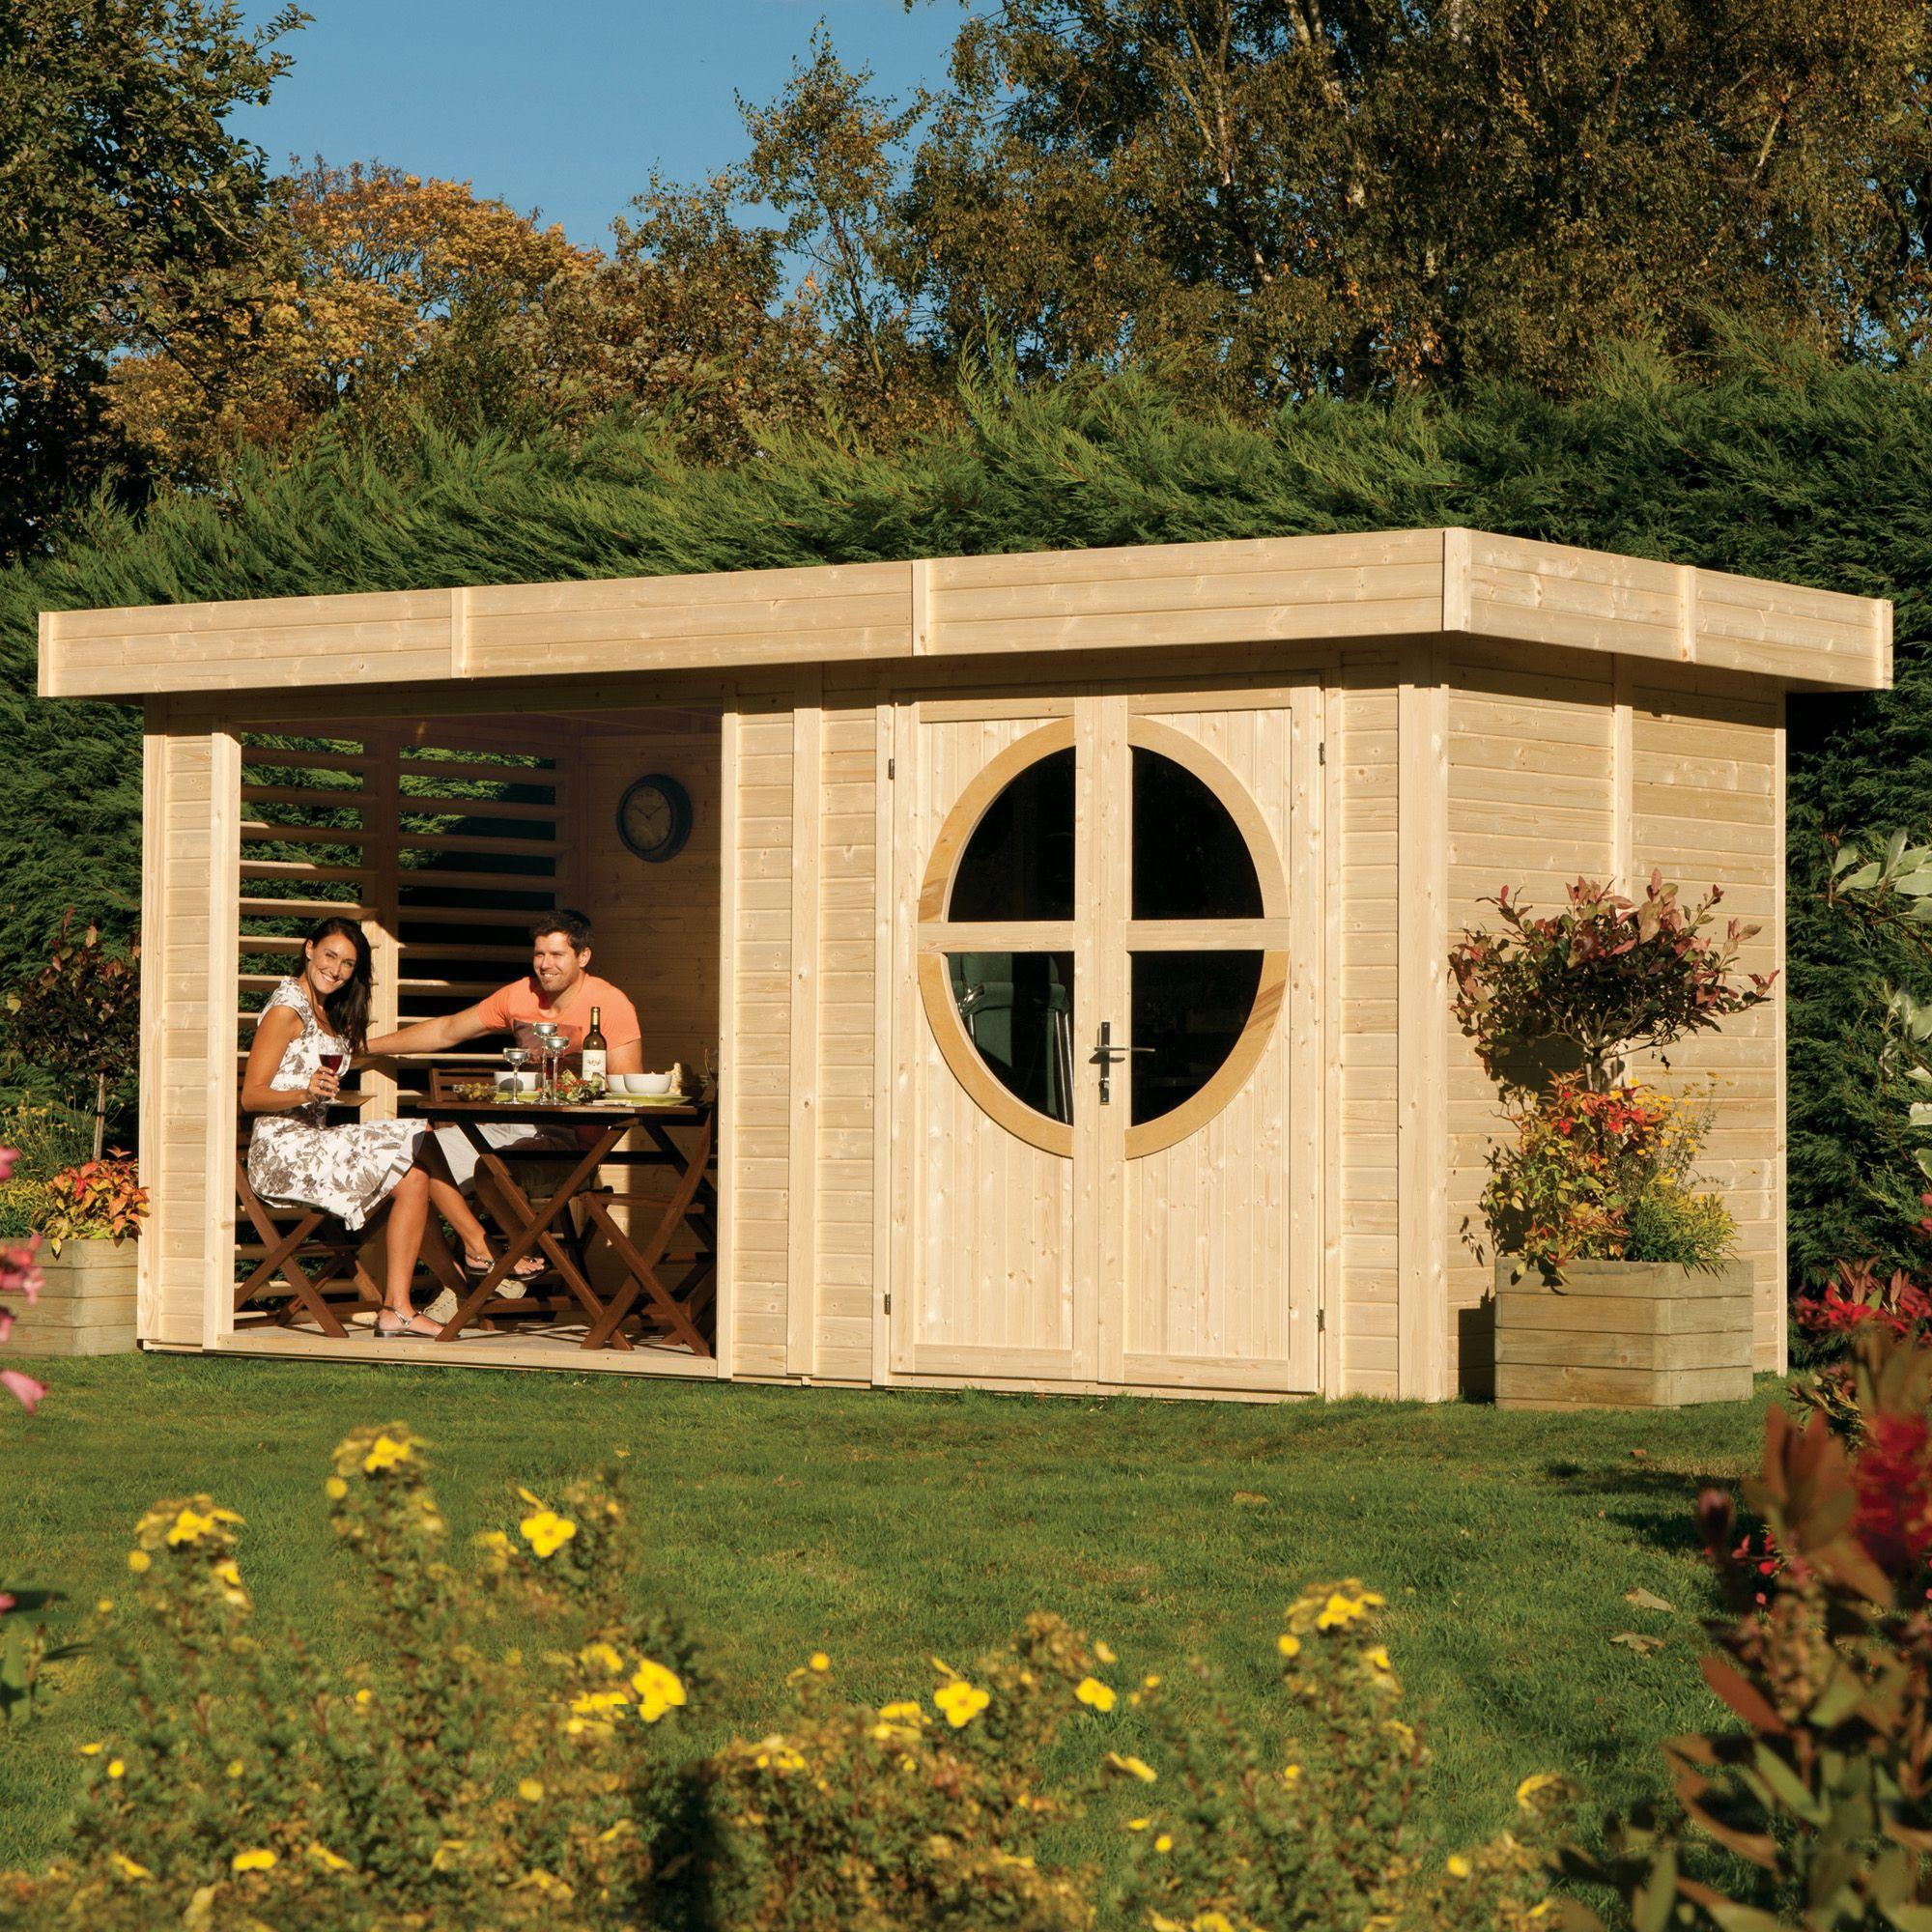 8x17 connor shiplap timber summerhouse base included. Black Bedroom Furniture Sets. Home Design Ideas